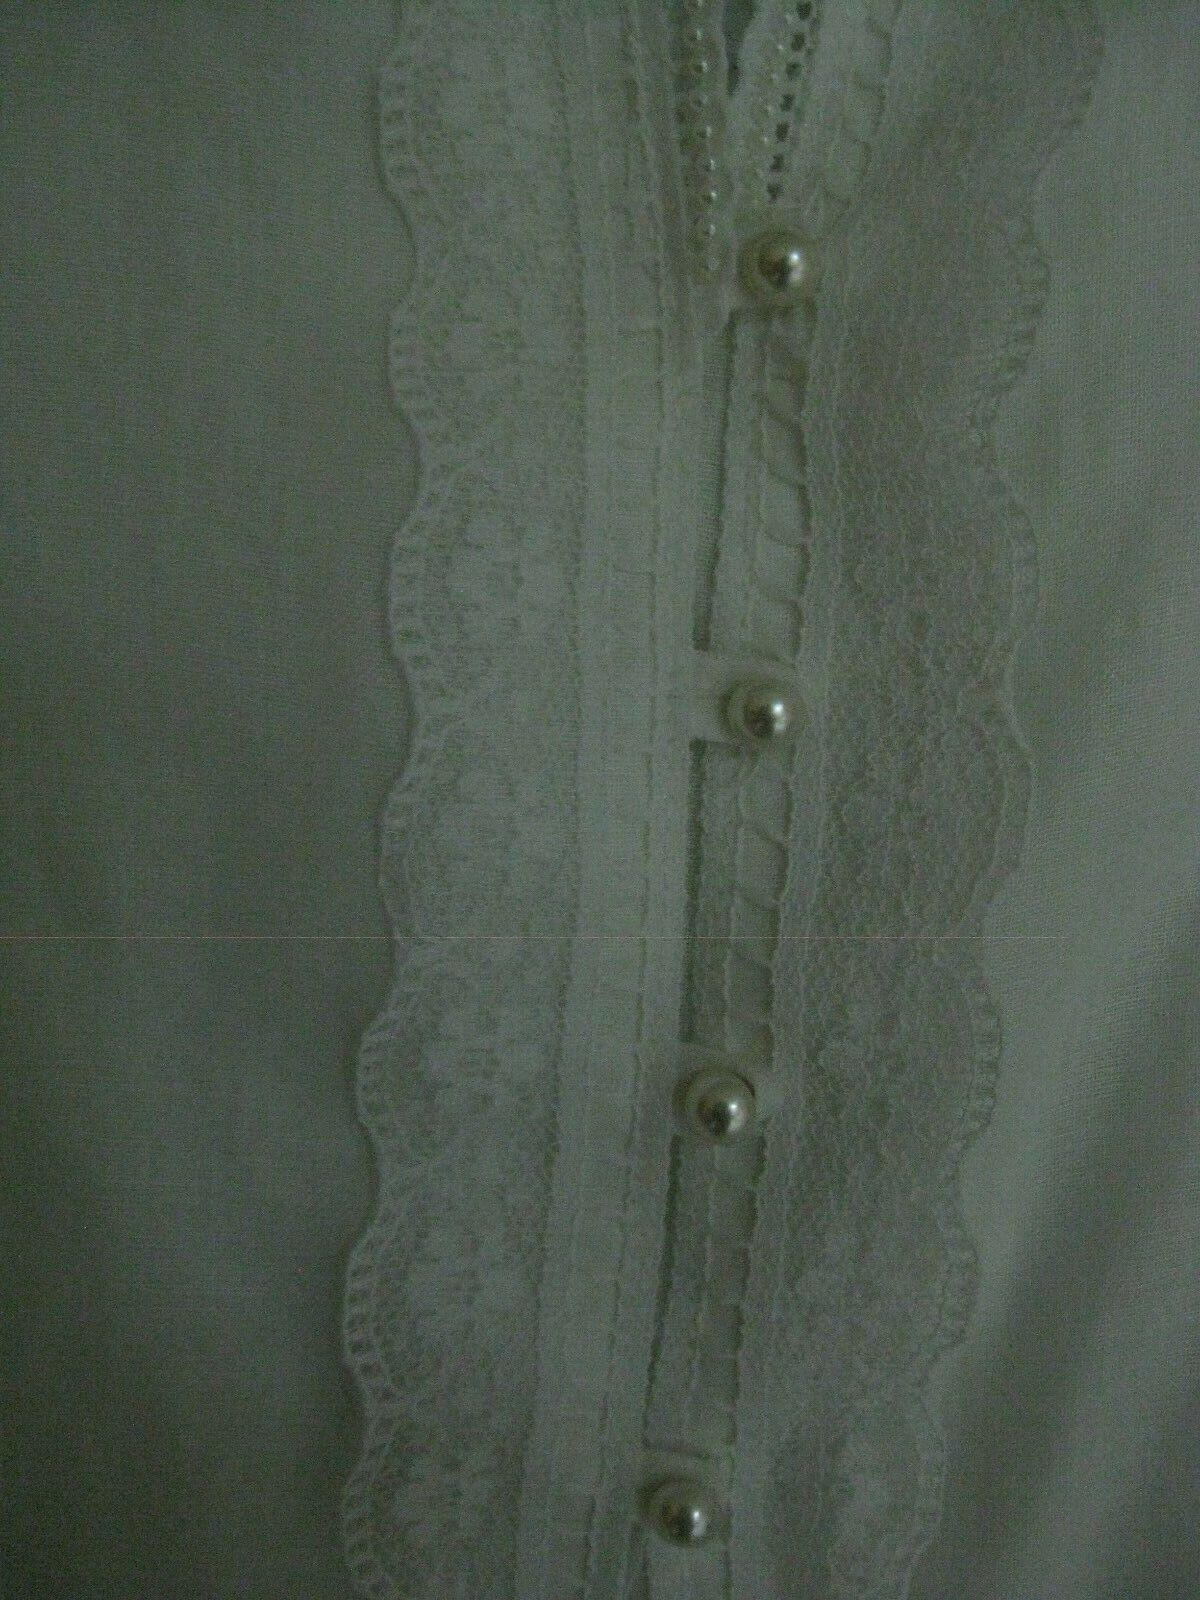 Gunne Sax White Dress Girls Size 12 Pre-Owned - image 4